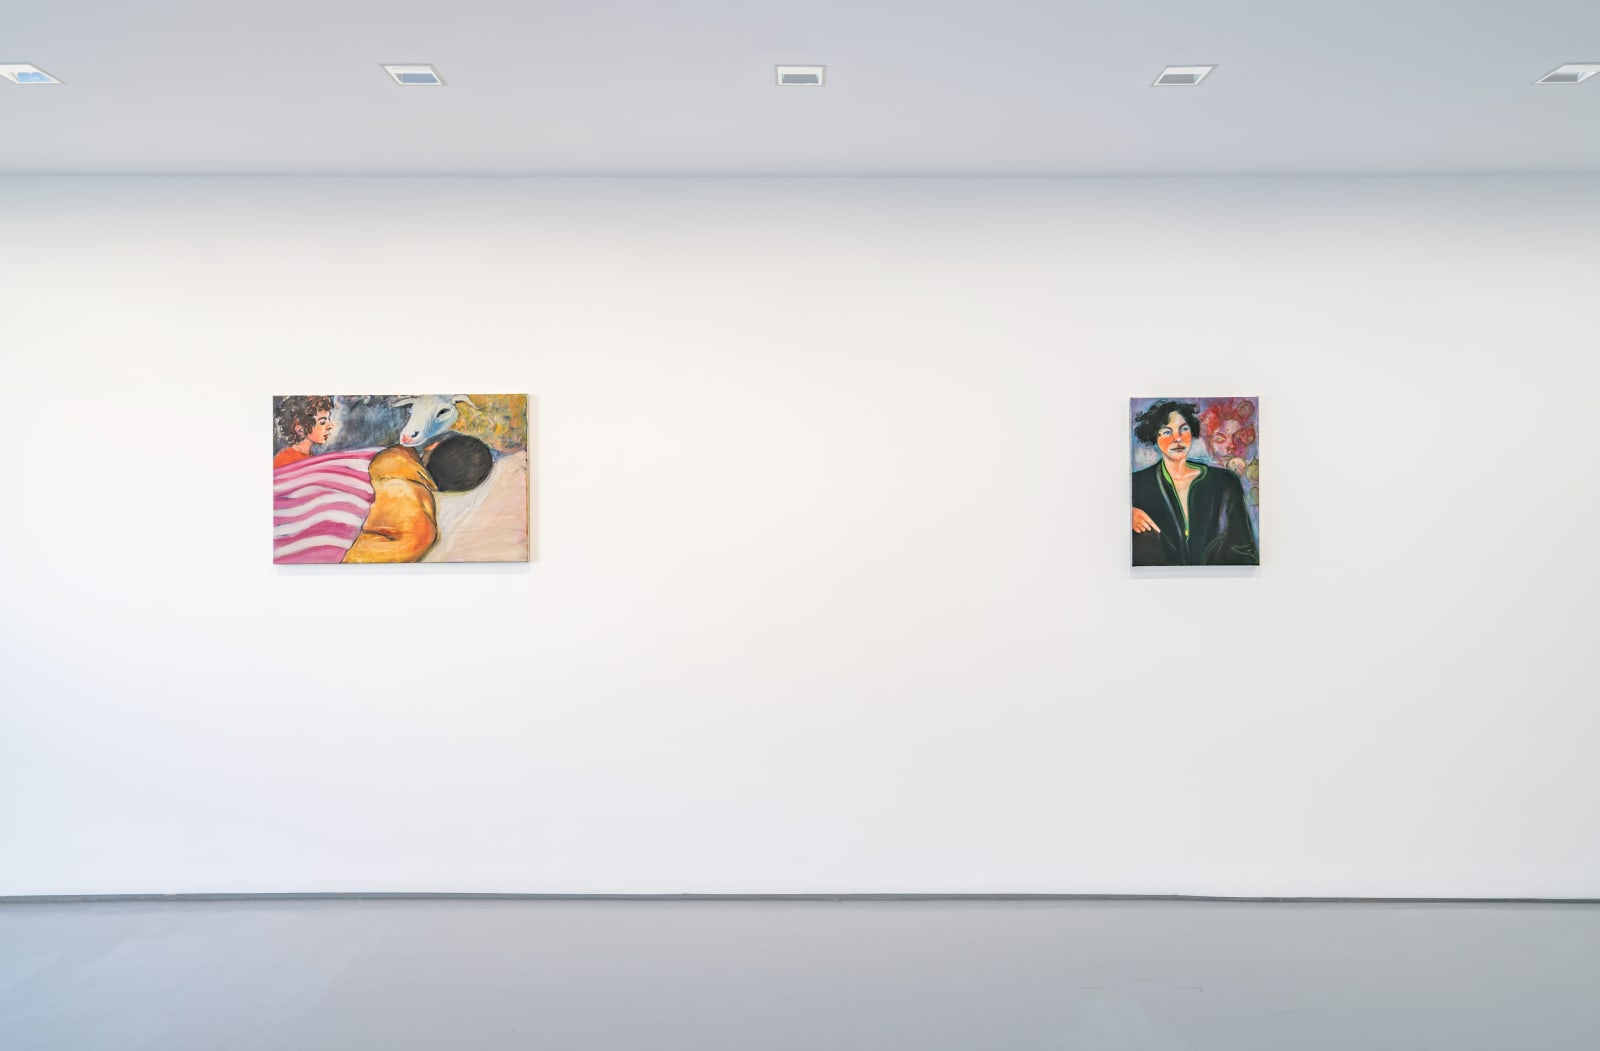 Rosalind Nashashibi, solo exhibition, 2020, GRIMM Van Baerlestraat installation view